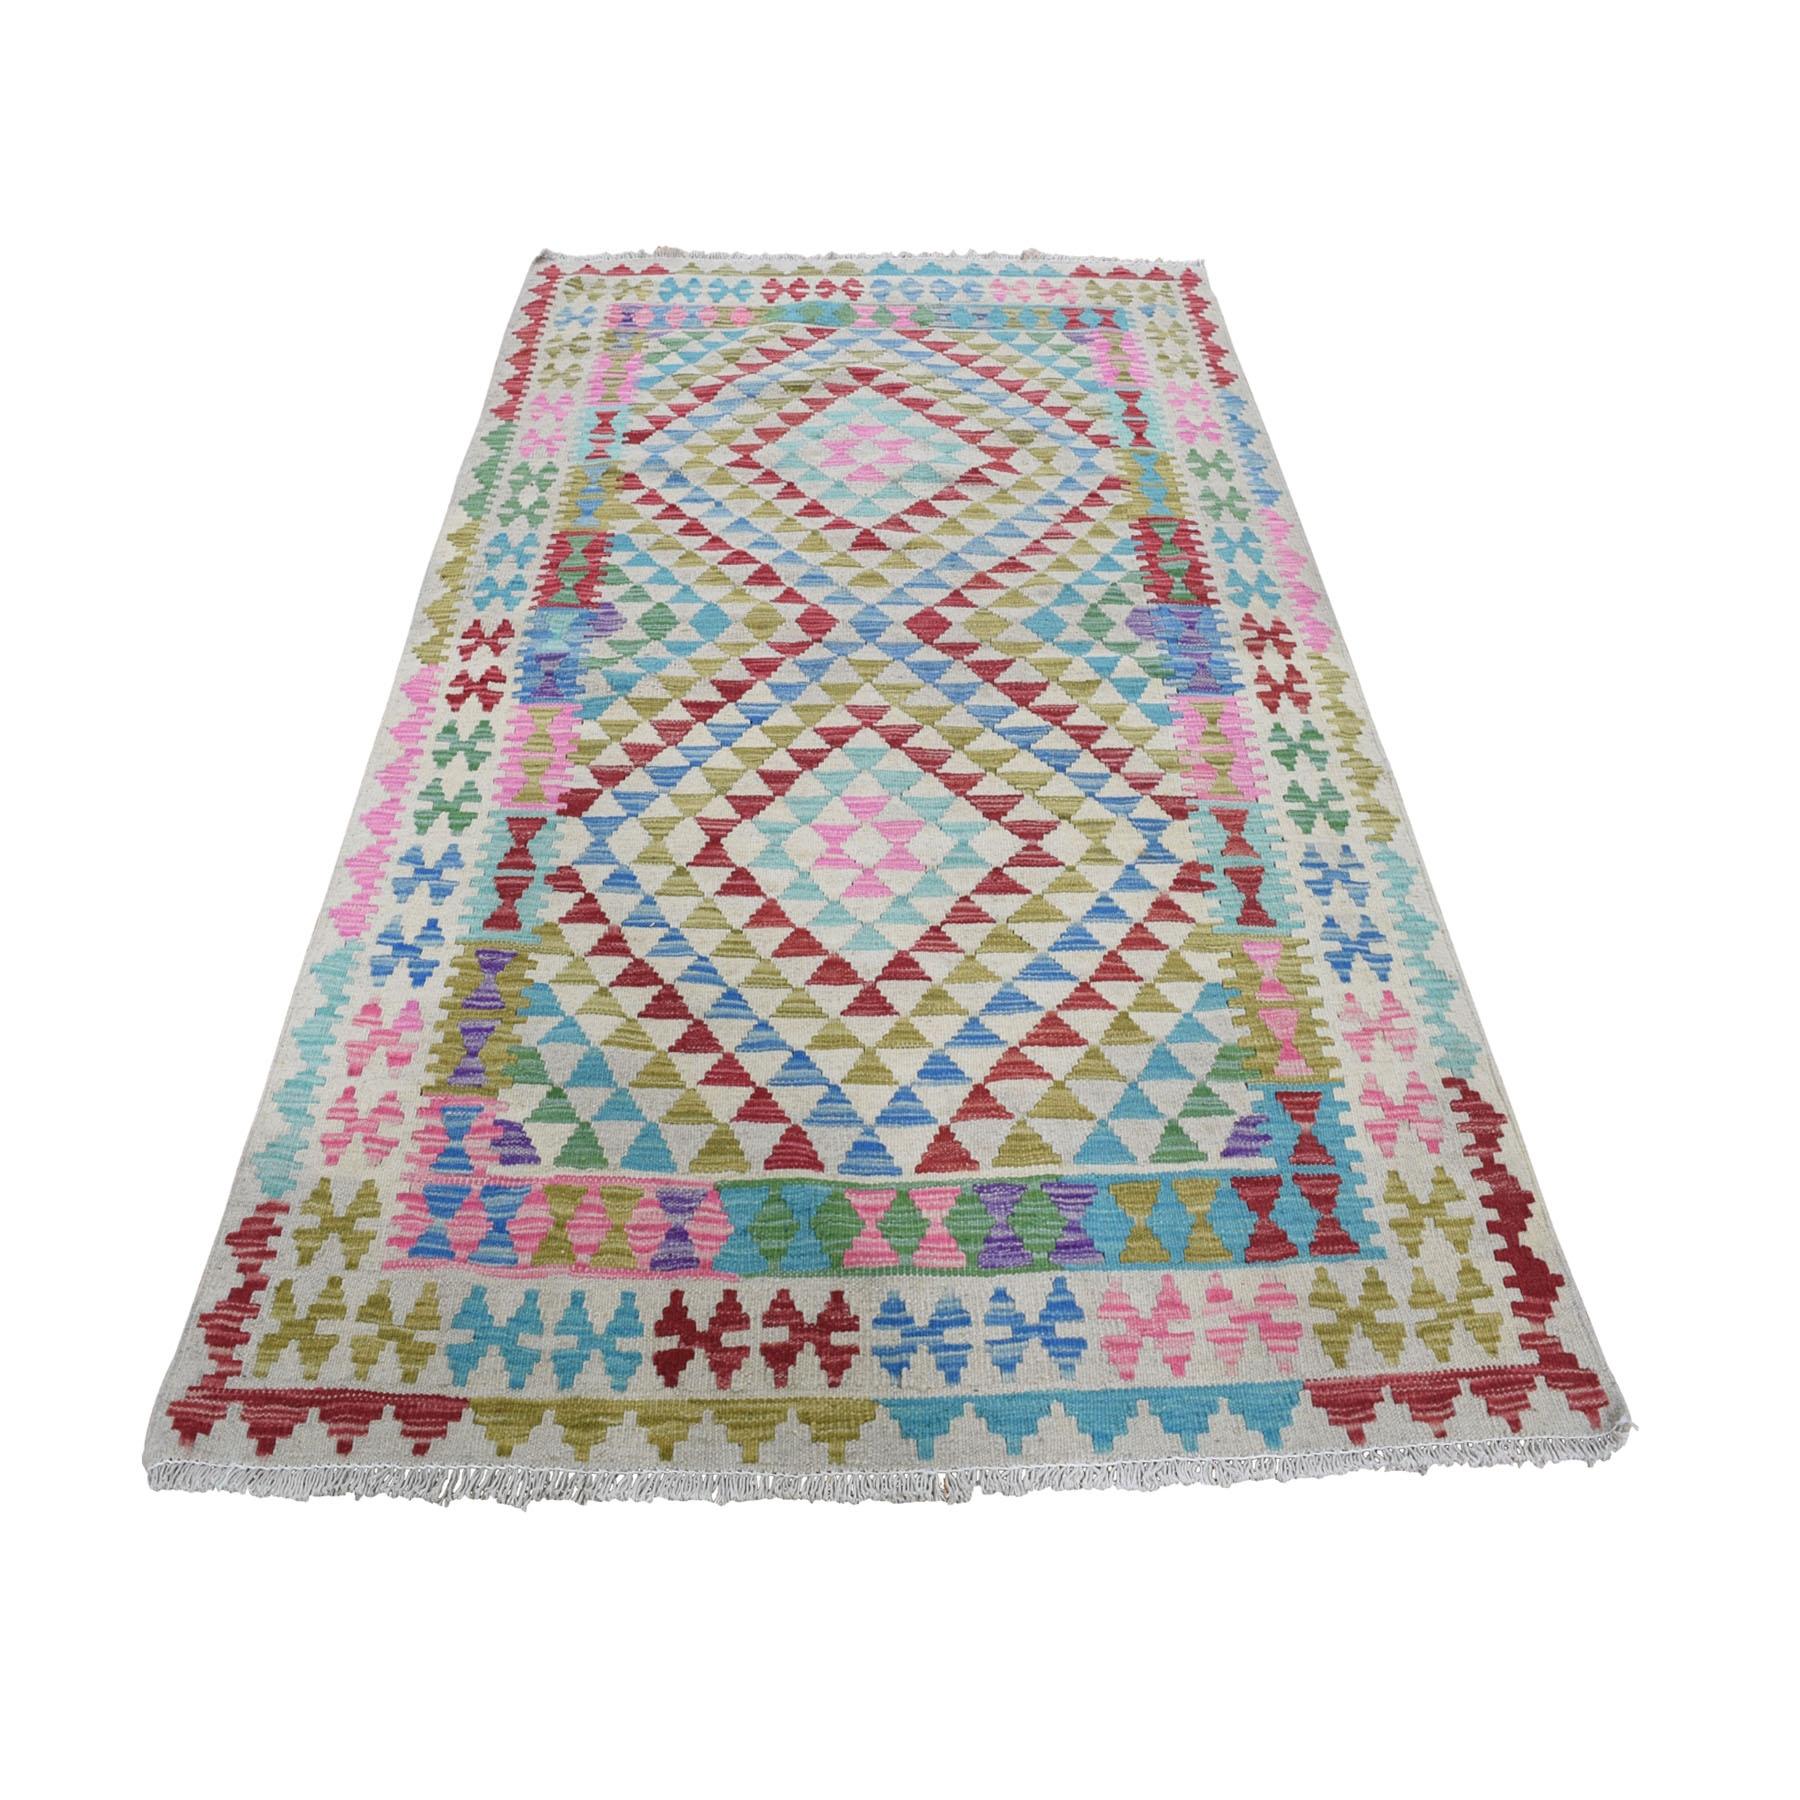 "4'X5'8"" Colorful Afghan Kilim Pure Wool Hand Woven Oriental Rug moad8adb"